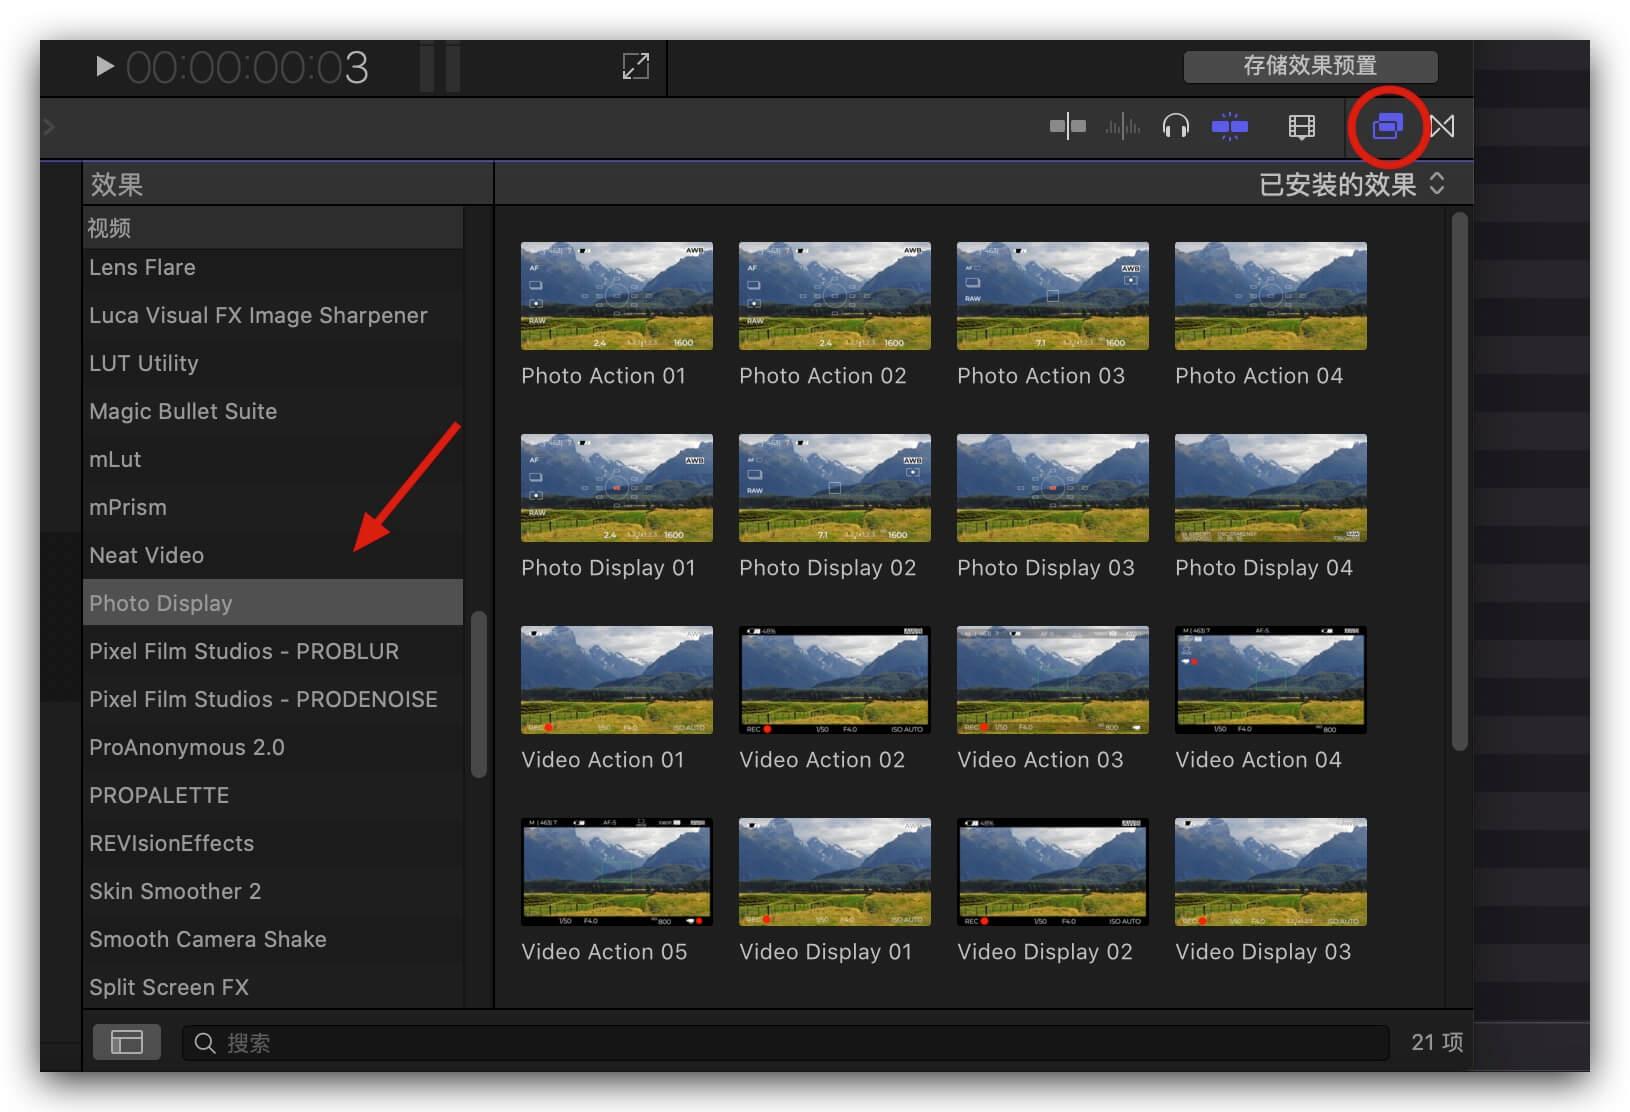 fcpx插件 21种相机拍摄动作照片定格屏显动画预设 Photo Display